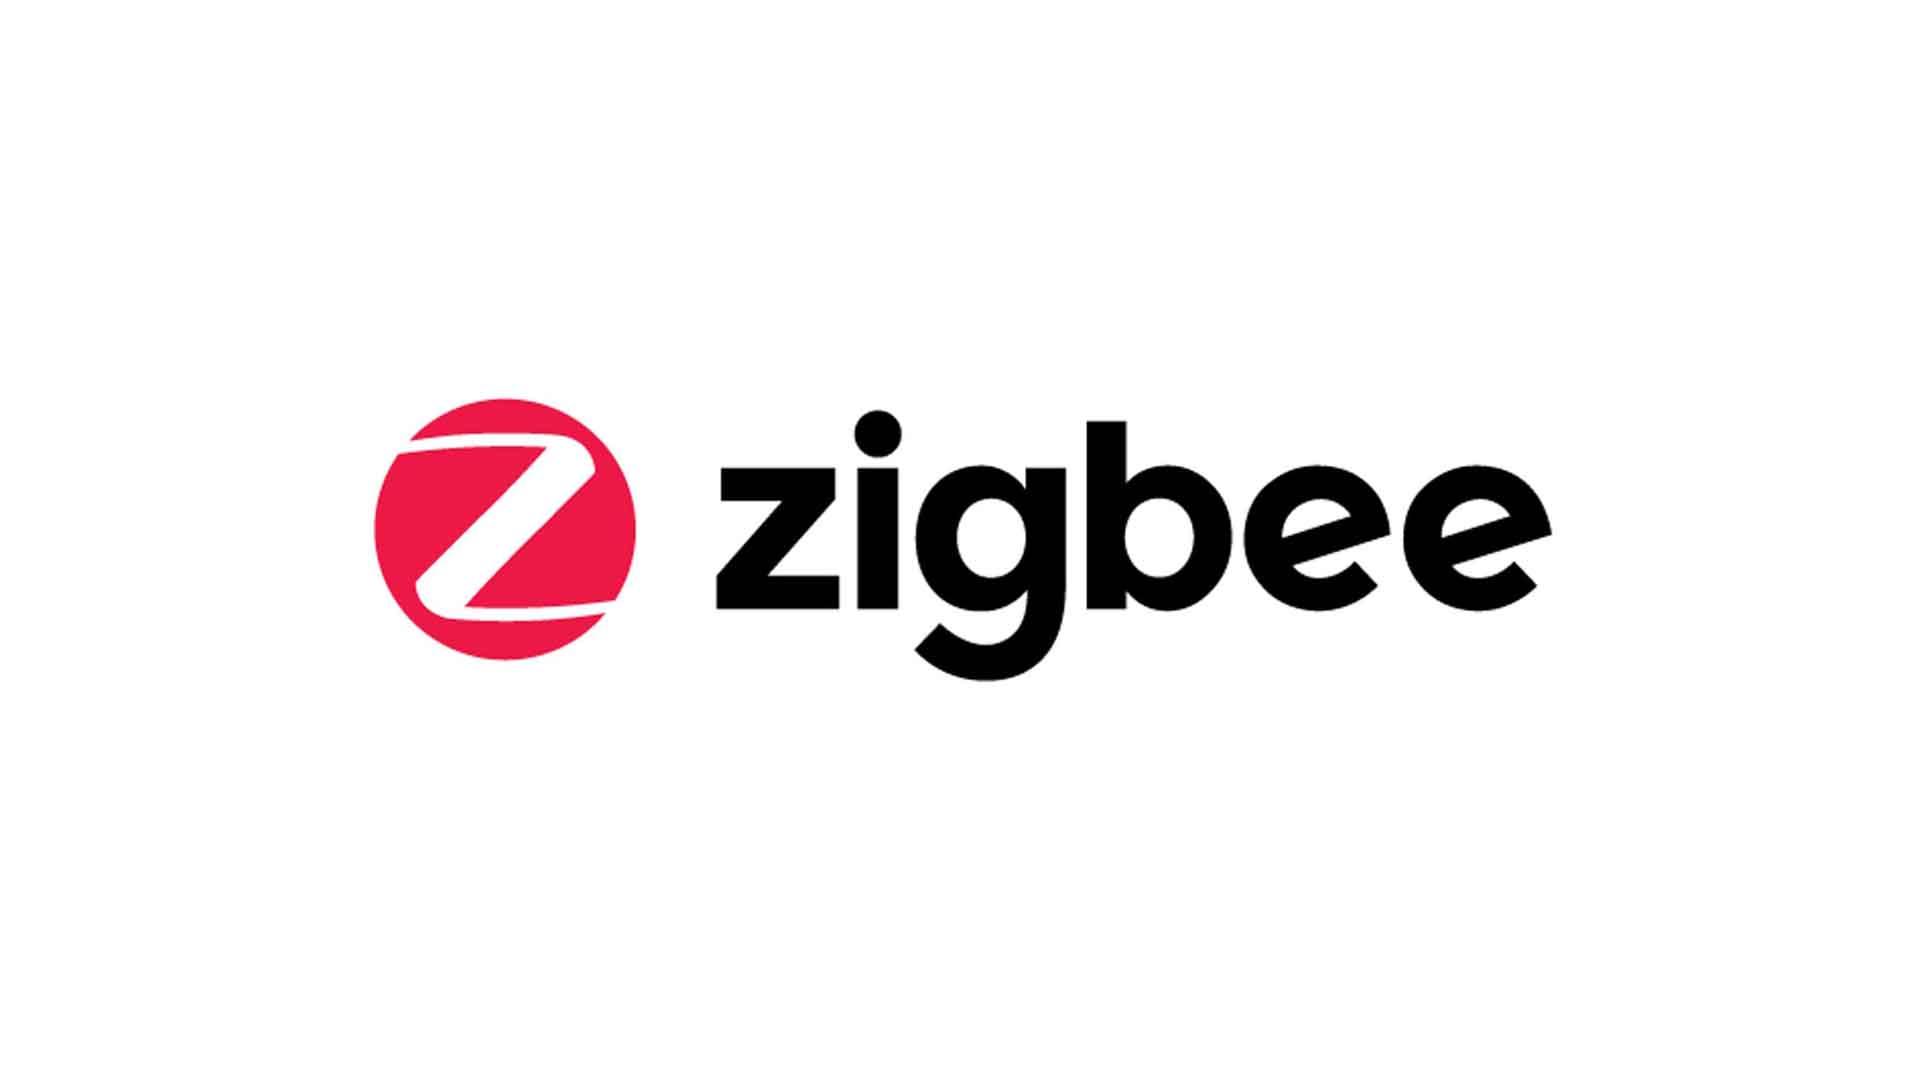 Технология Zigbee в умном доме: компоненты, частота, каналы